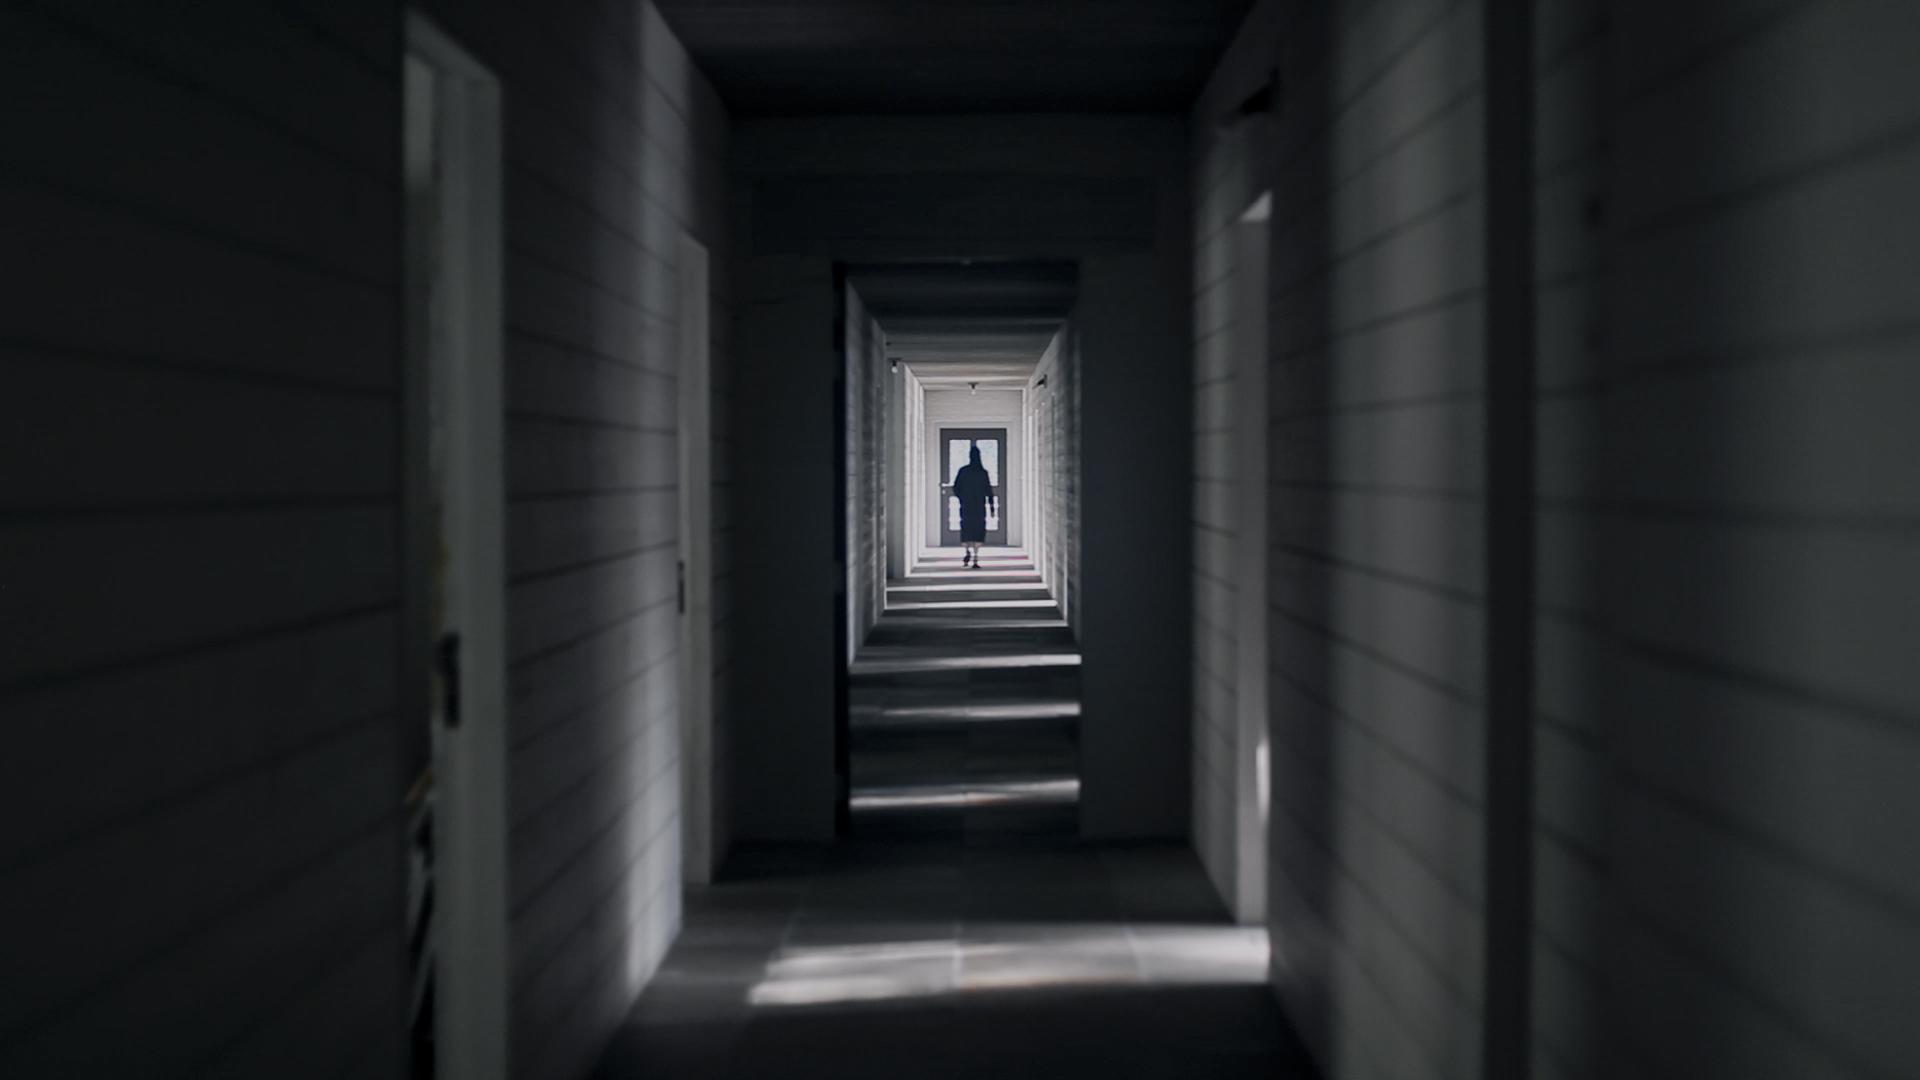 "Ingel Vaikla ""Aine ja tühjuse vahel"" (Between Solid and the Void). Foto: Kaader teosest."